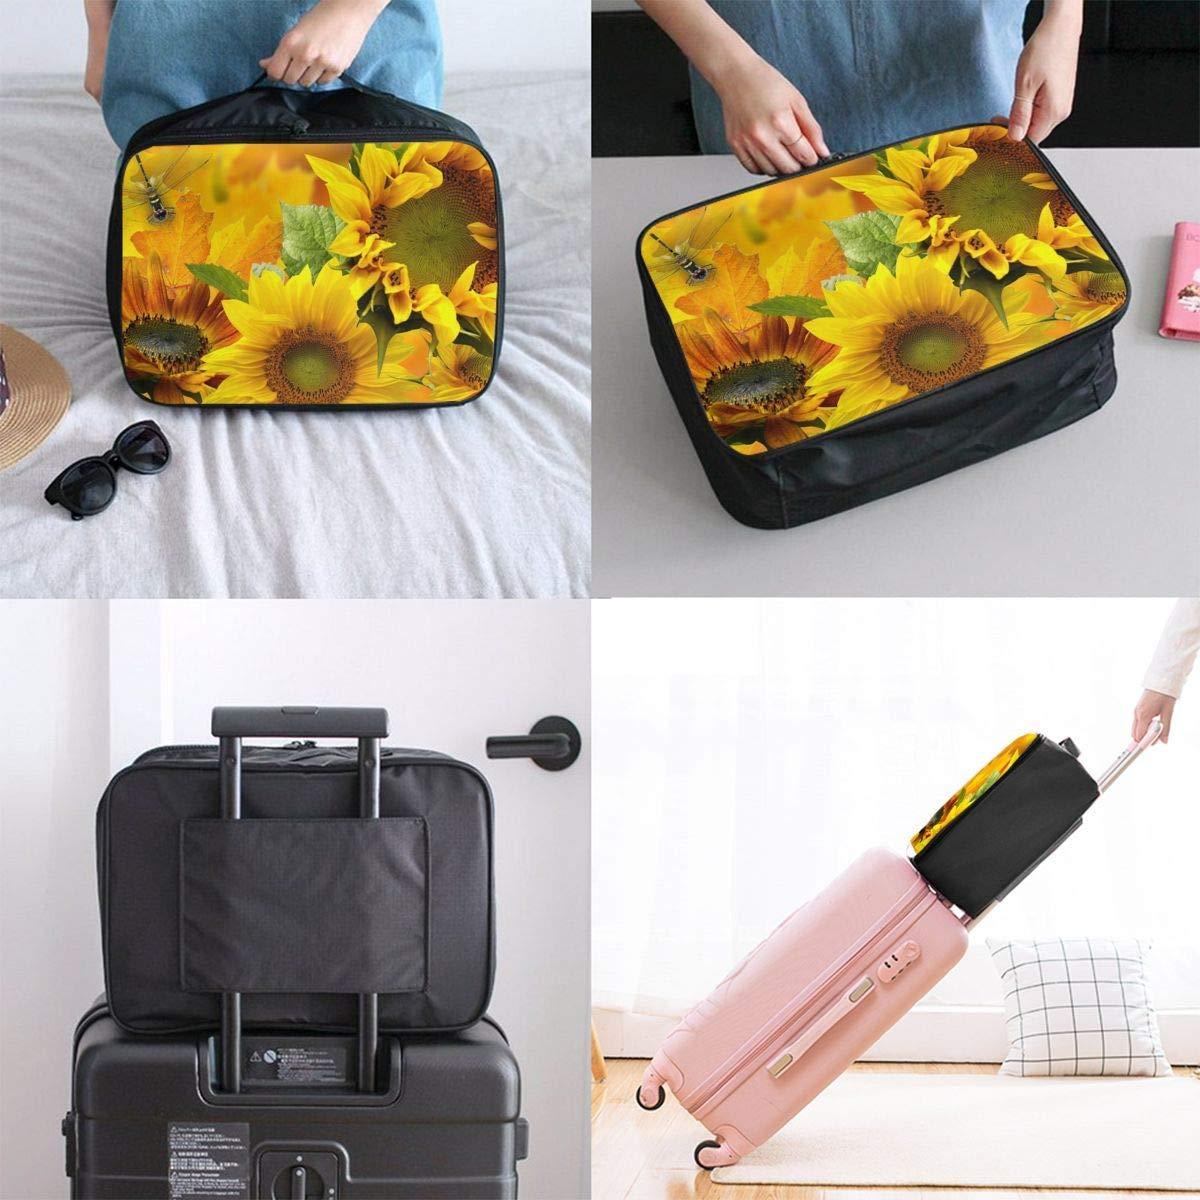 JTRVW Luggage Bags for Travel Yellow Sunflower Travel Duffel Bag Waterproof Fashion Lightweight Large Capacity Portable Duffel Bag for Men /& Women